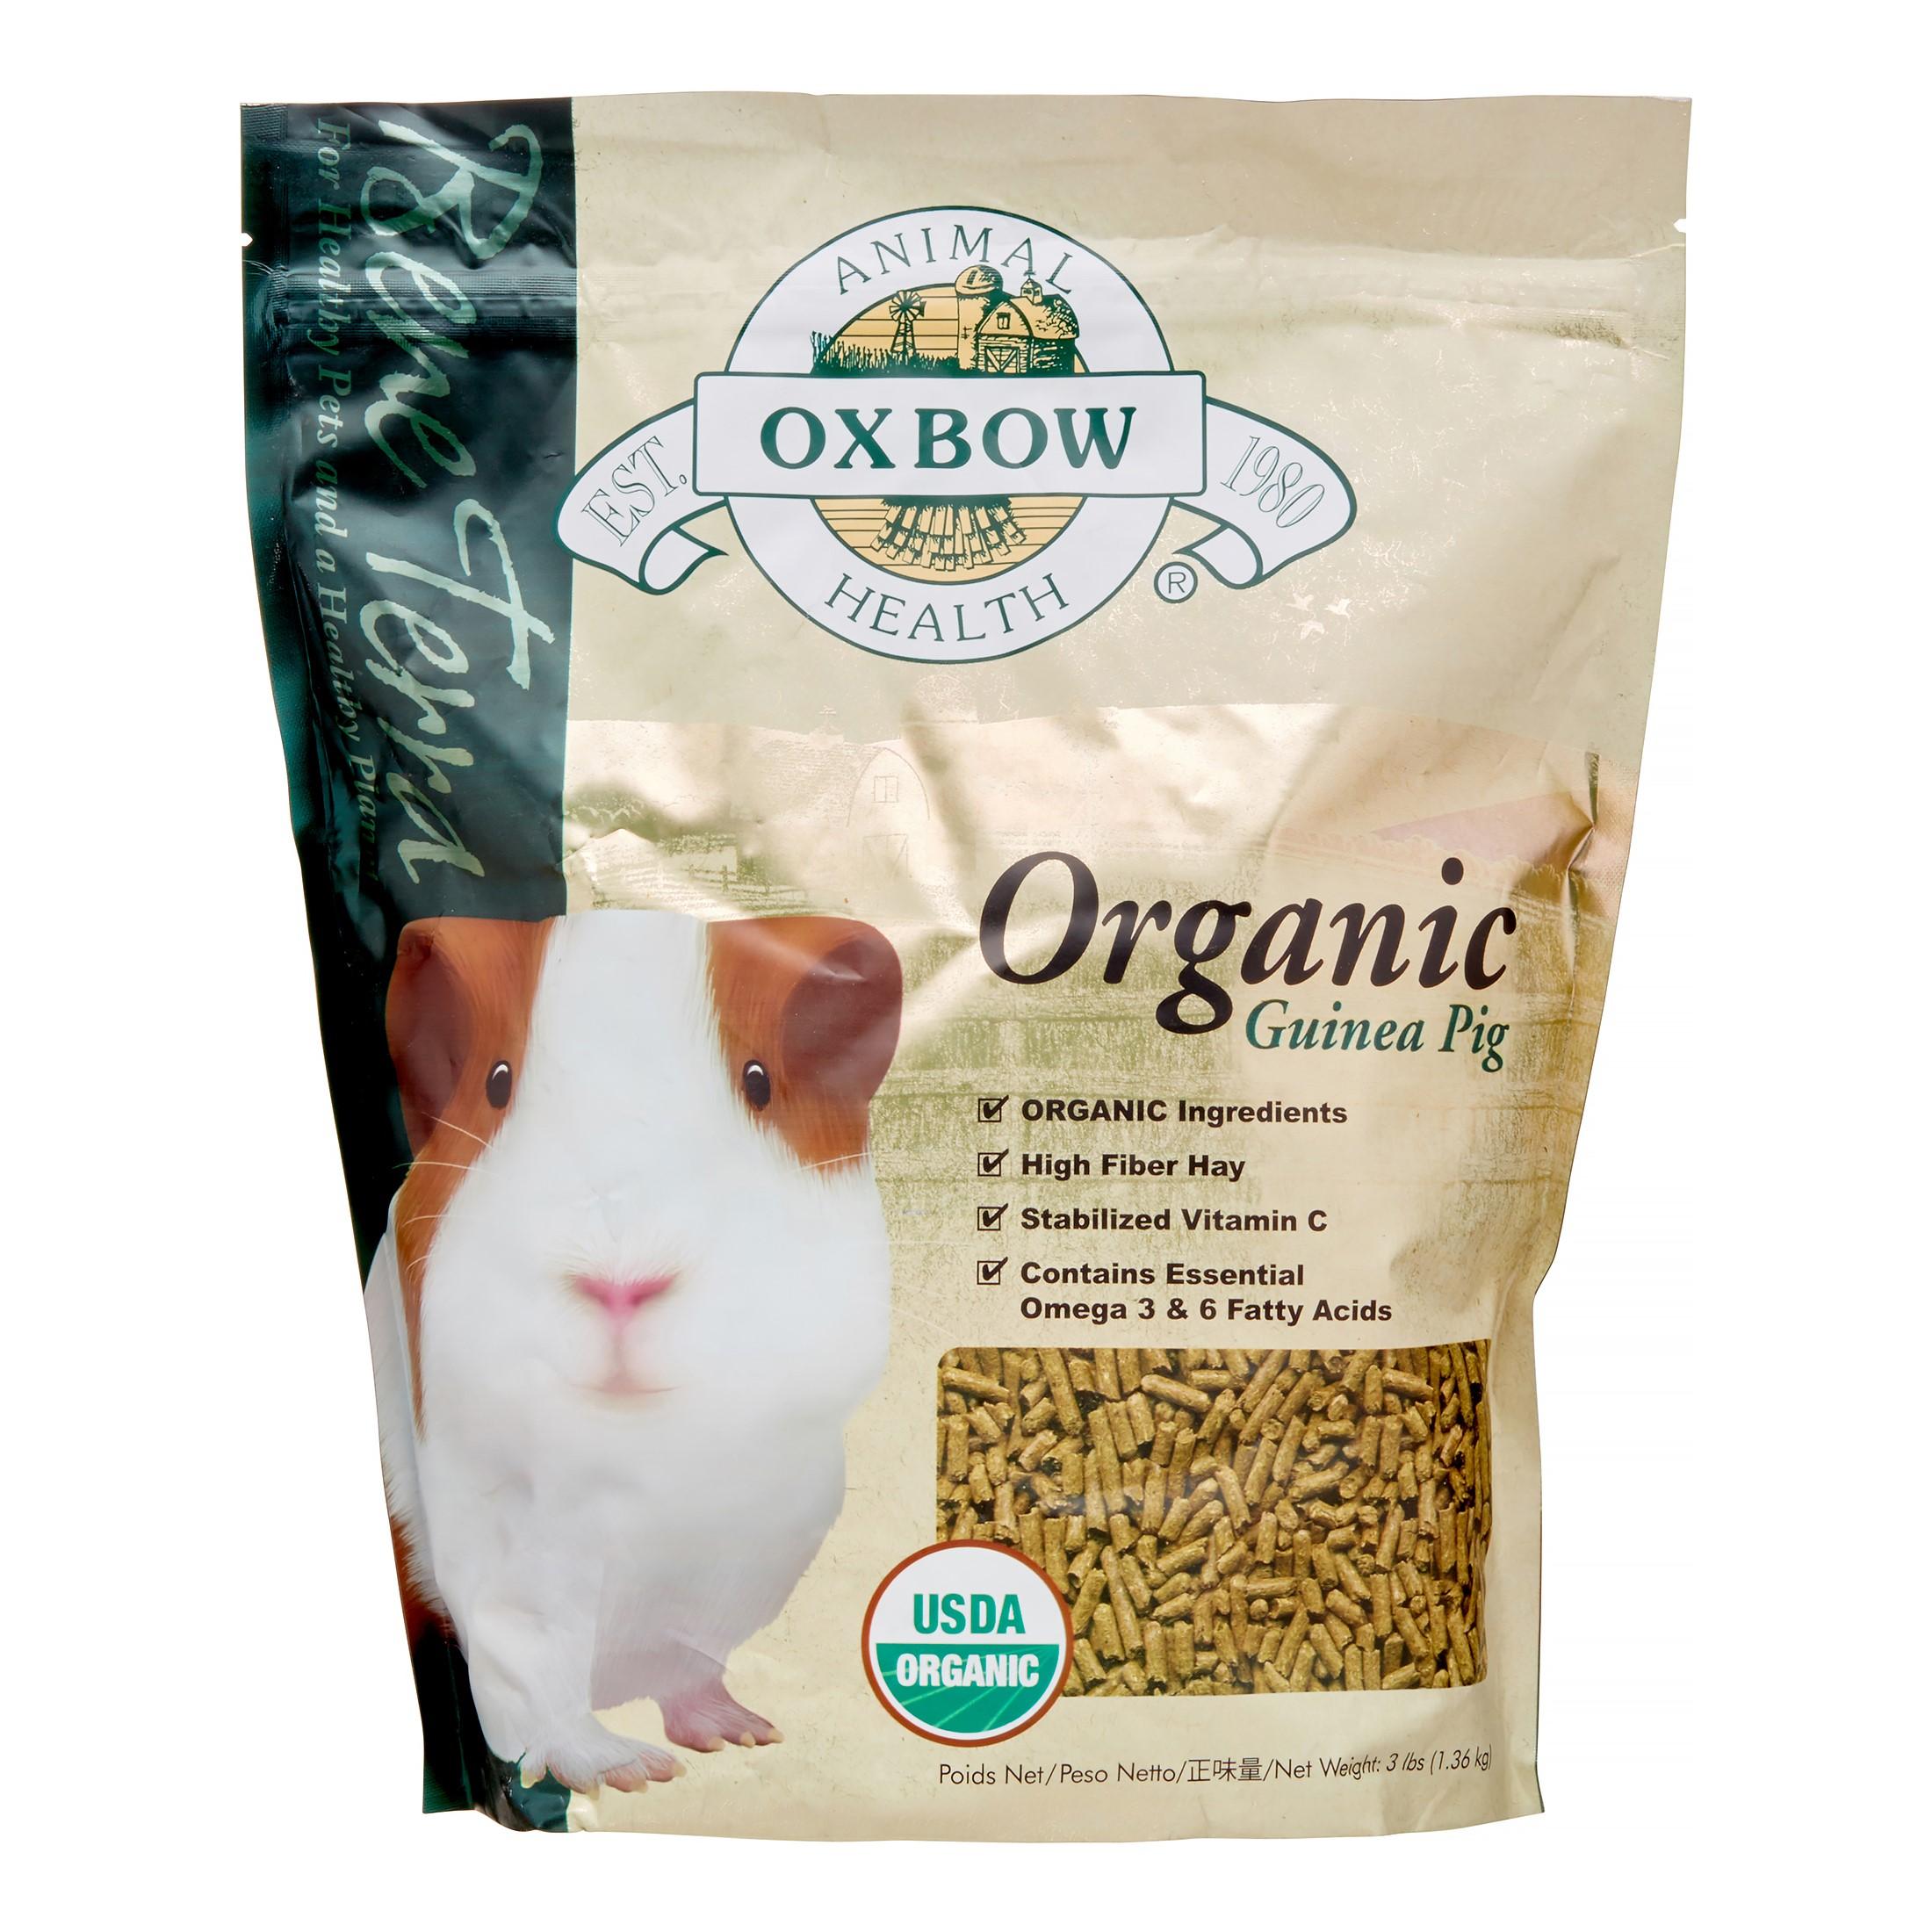 Oxbow Bene Terra Organic Guinea Pig Dry Small Animal Food, 3 lbs.